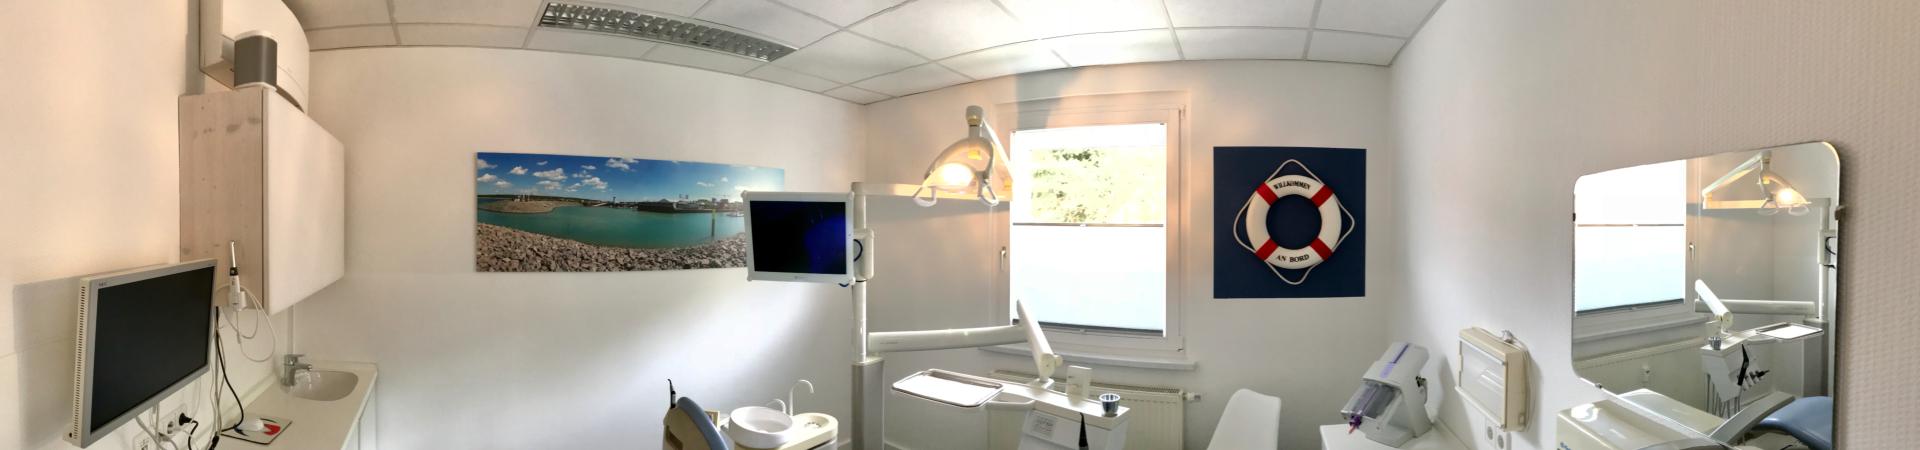 Foto des Behandlungszimmers 1